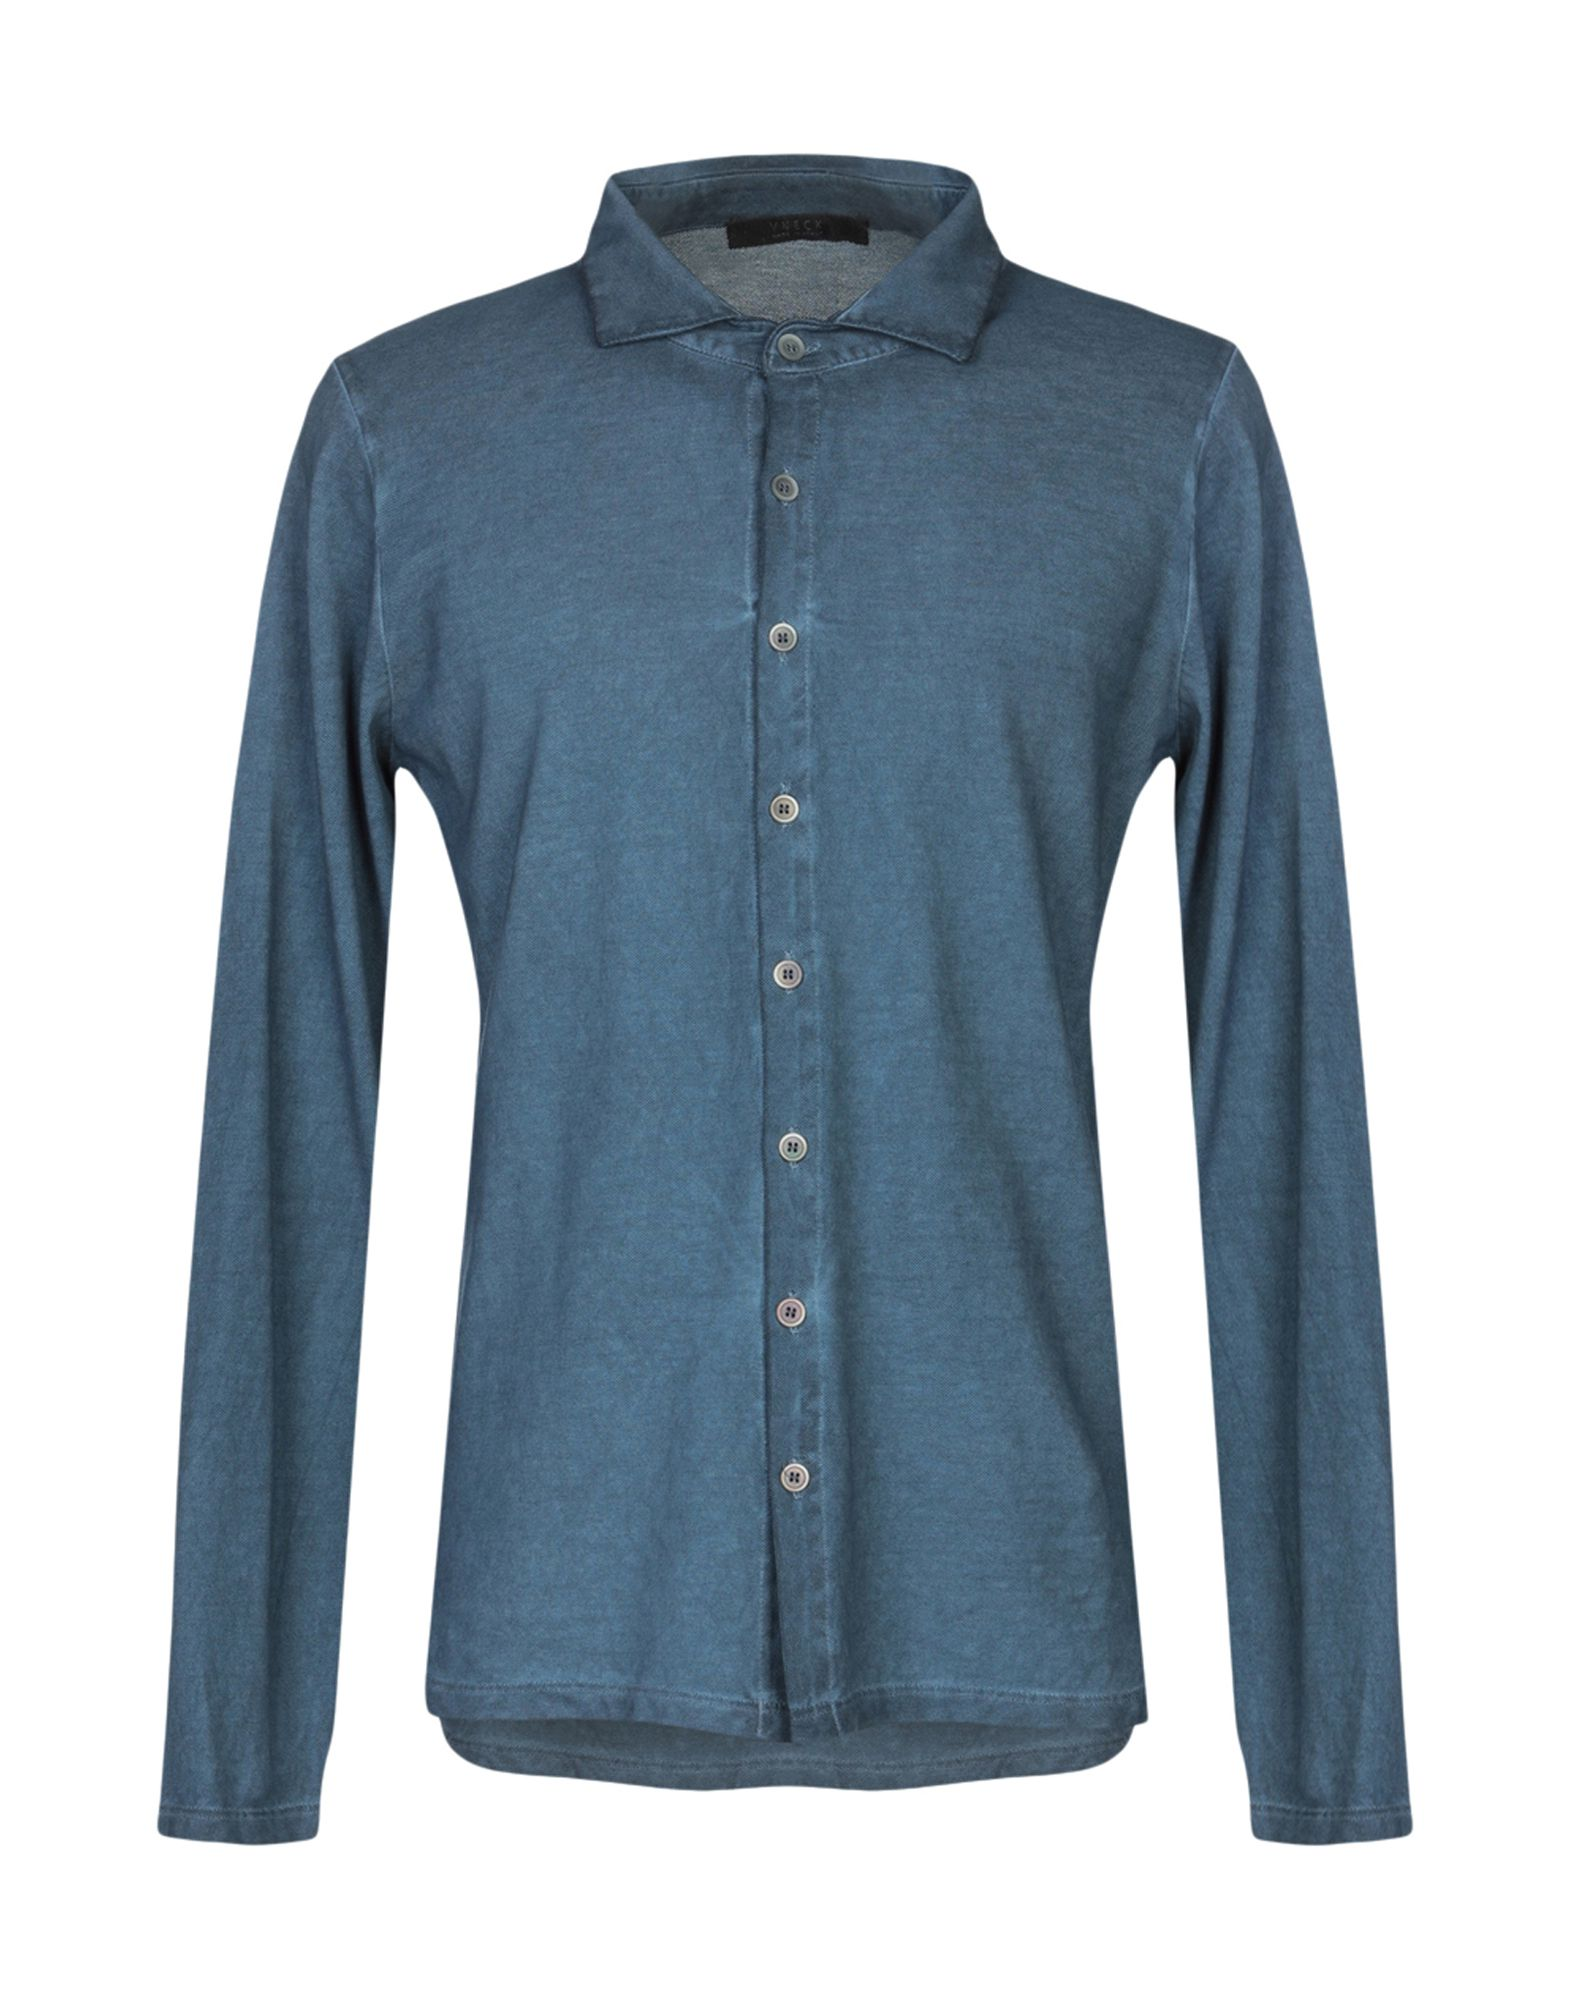 VNECK Pубашка футболка поло regular fit